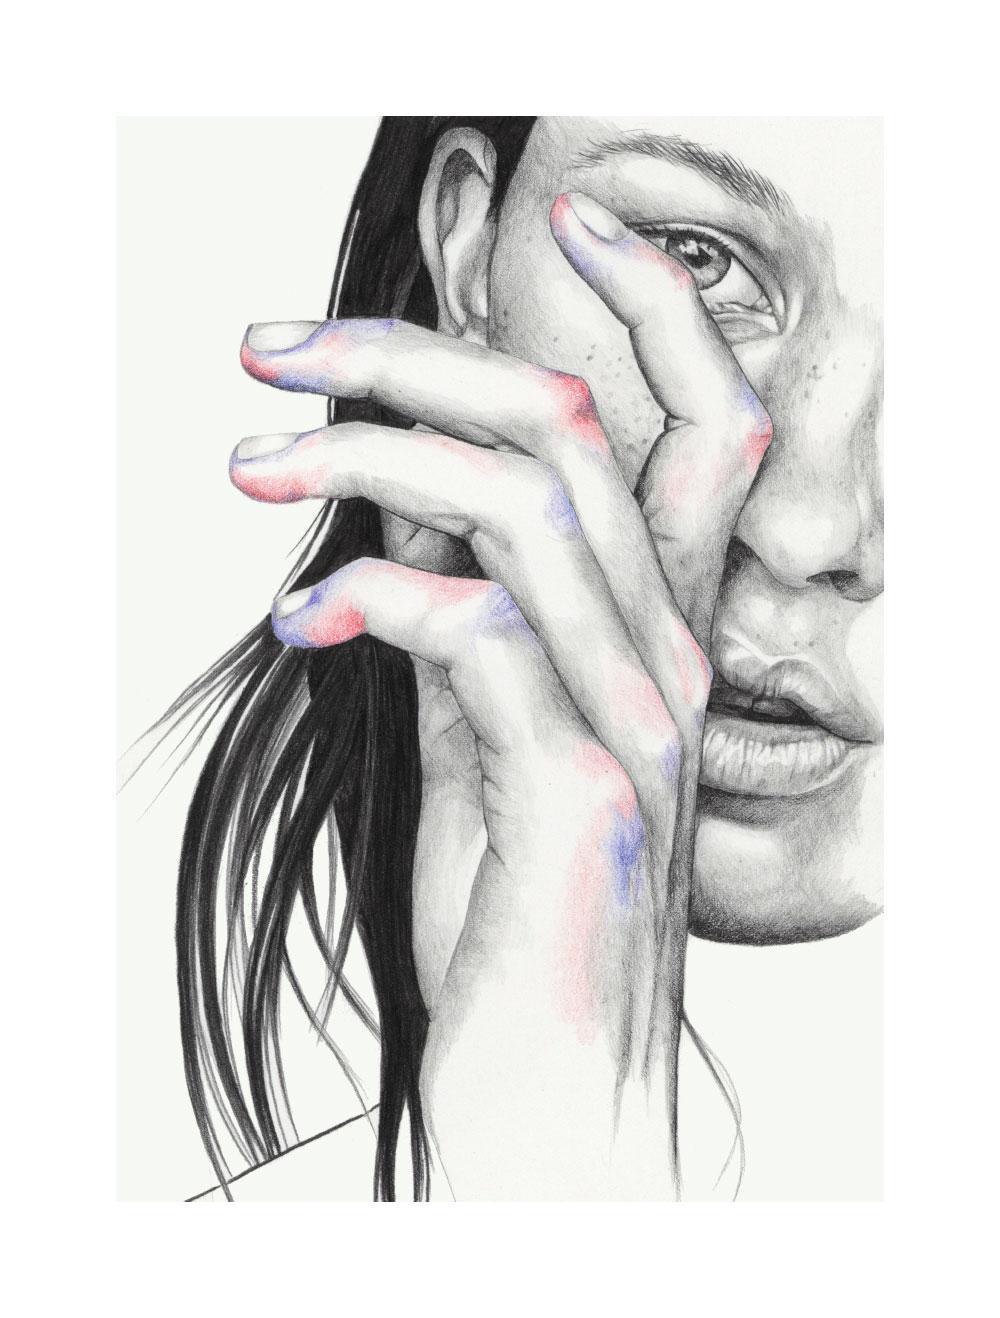 Graphite and pencil illustration